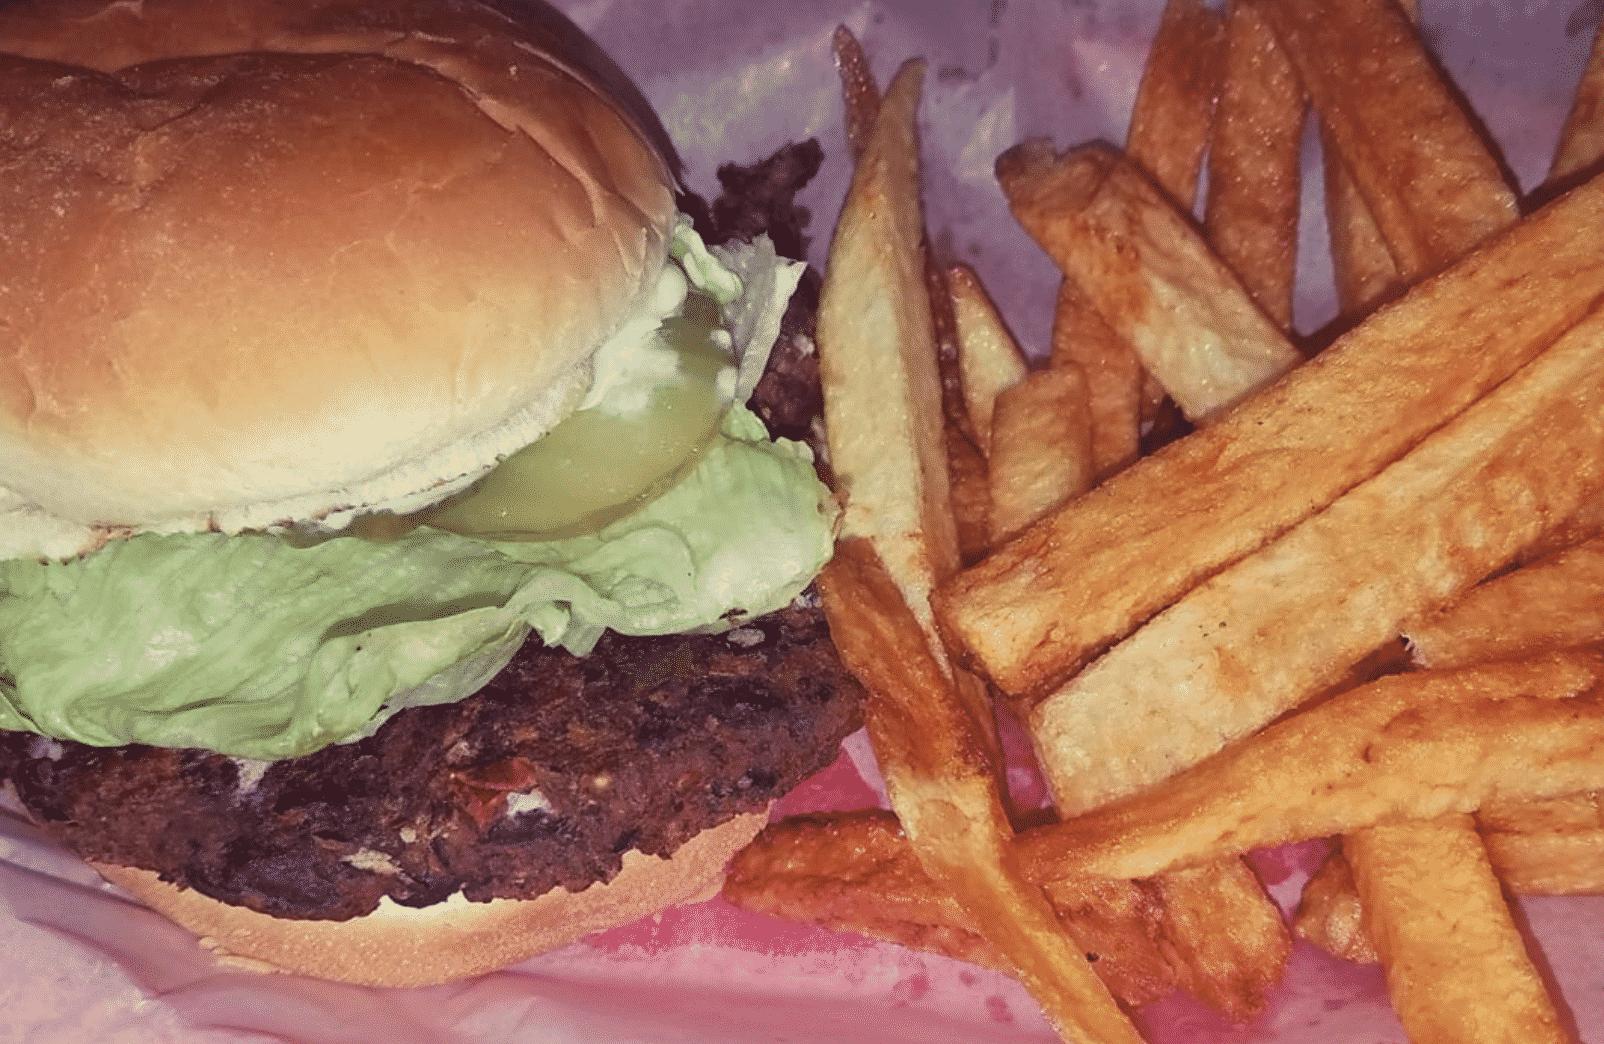 Burgers In West Virginia